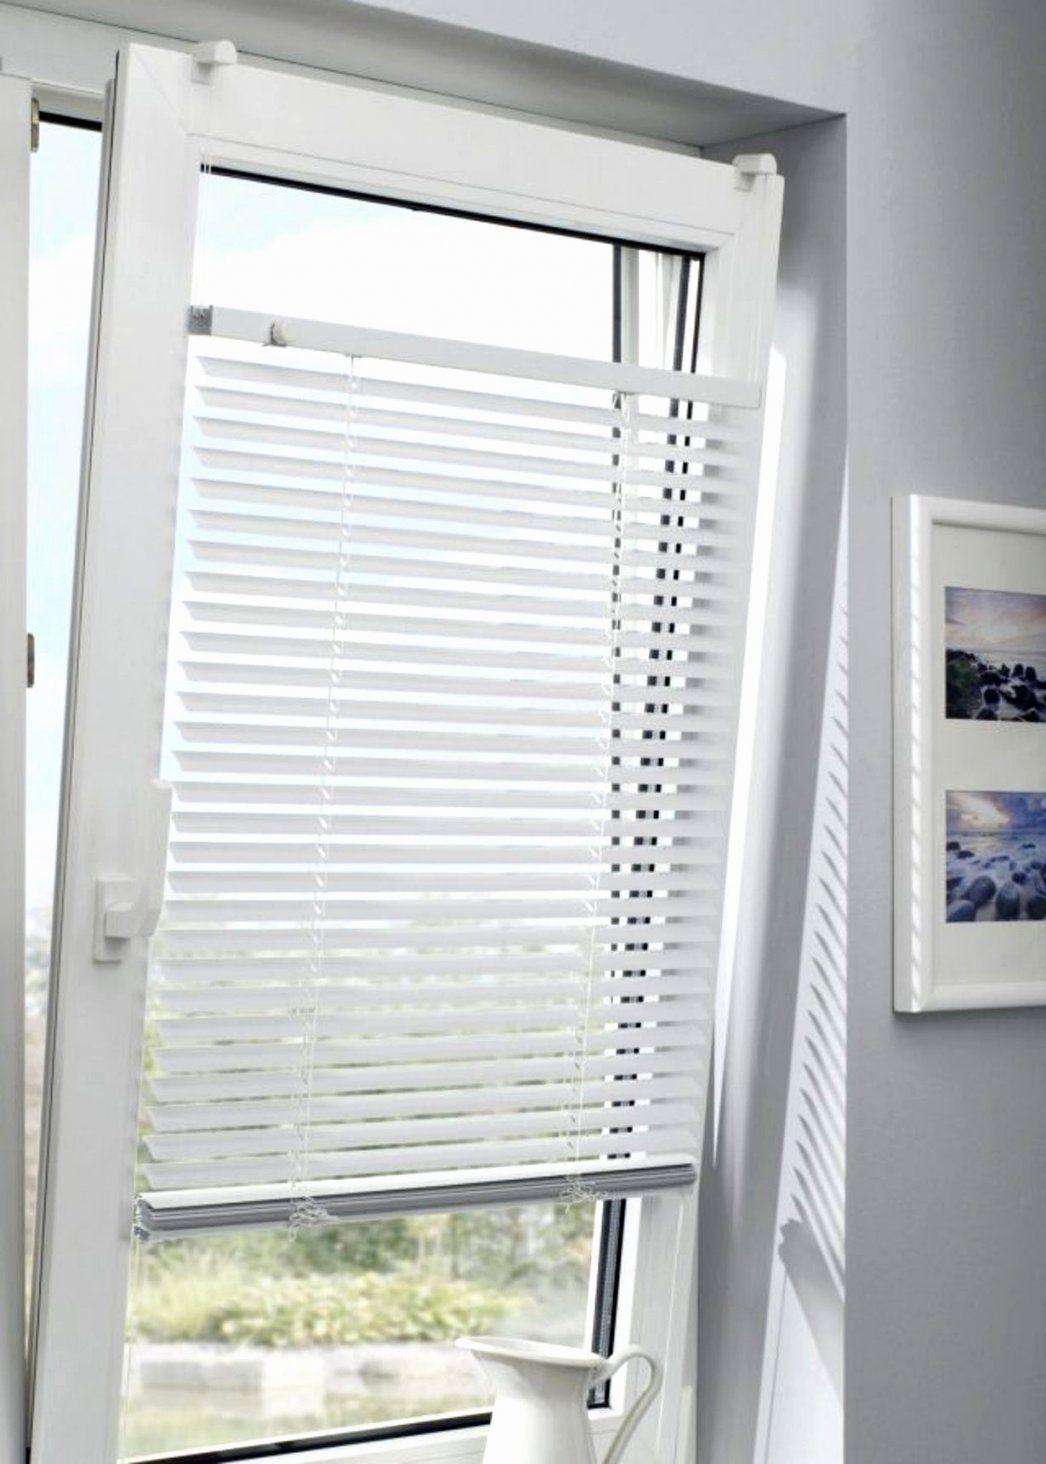 Dachfenster rollo ohne bohren for Dachfenster rollo ohne bohren